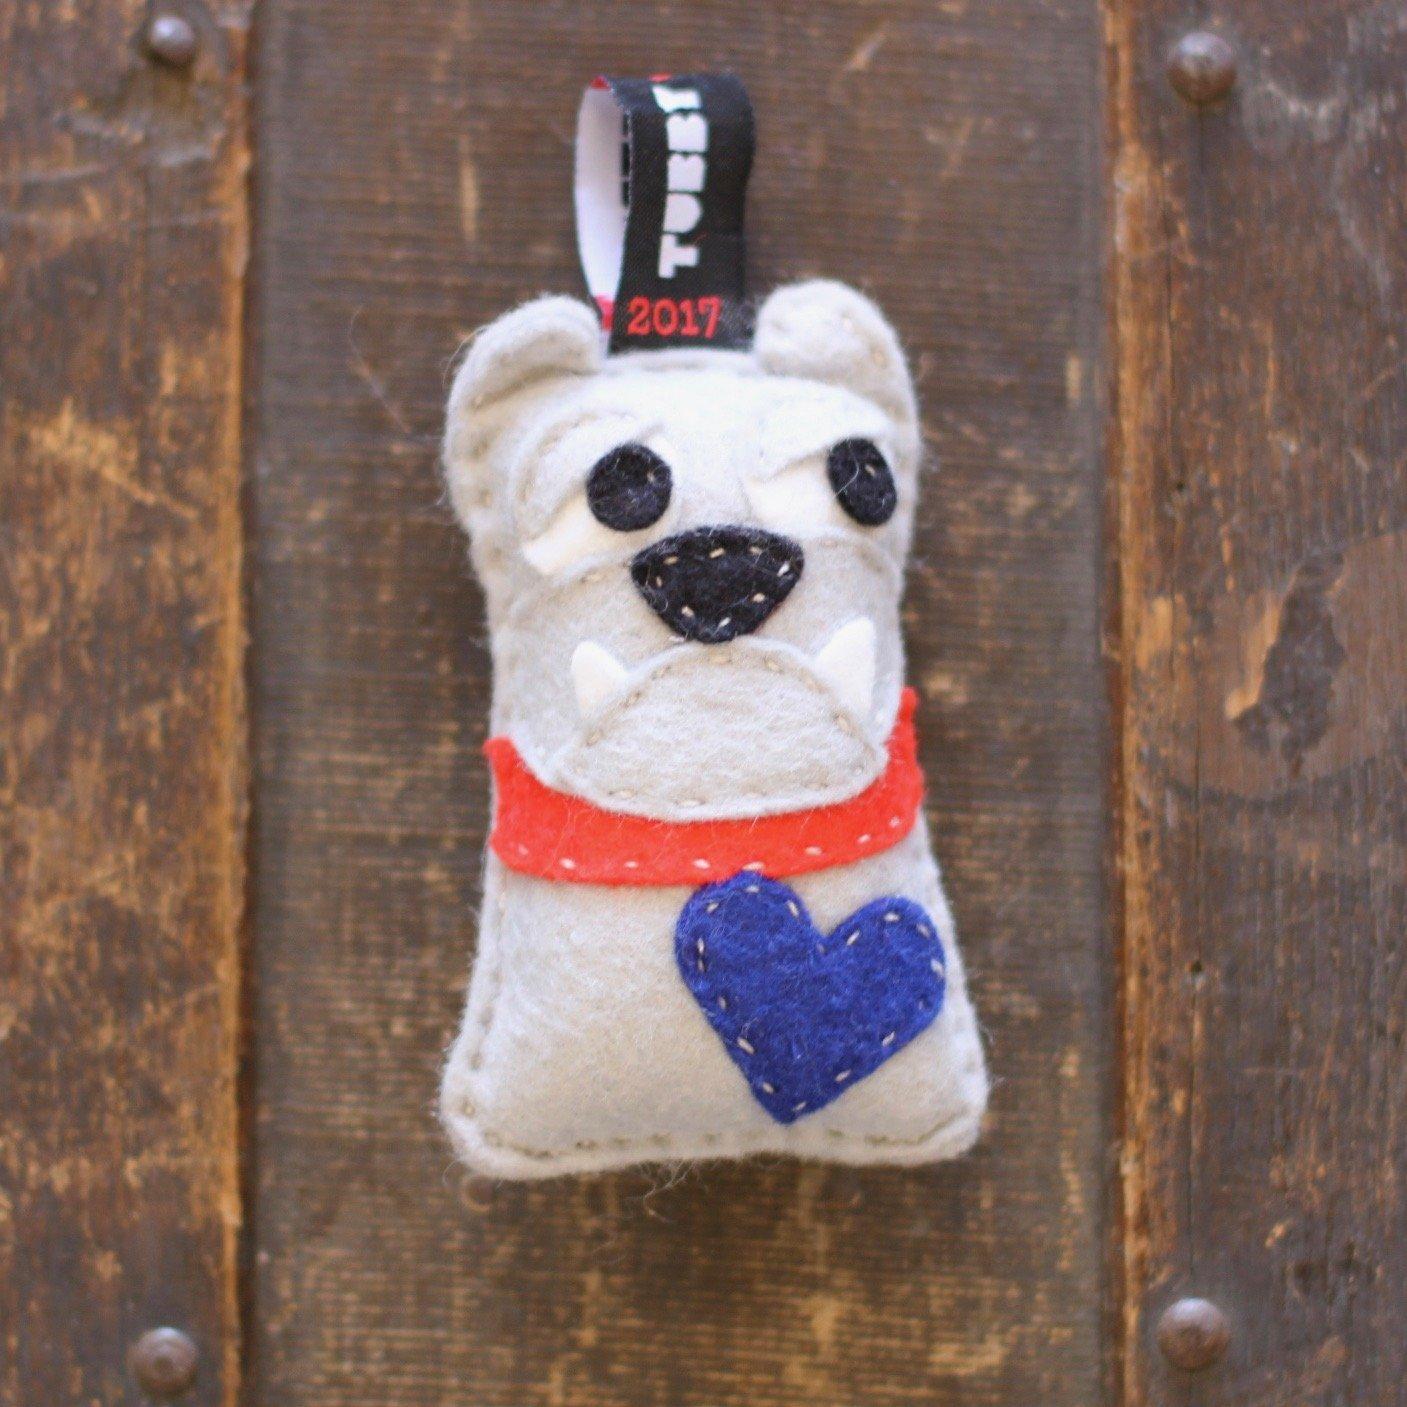 TubbyWubby Stitch & Stuff Critter Kit - Barry the Bulldog